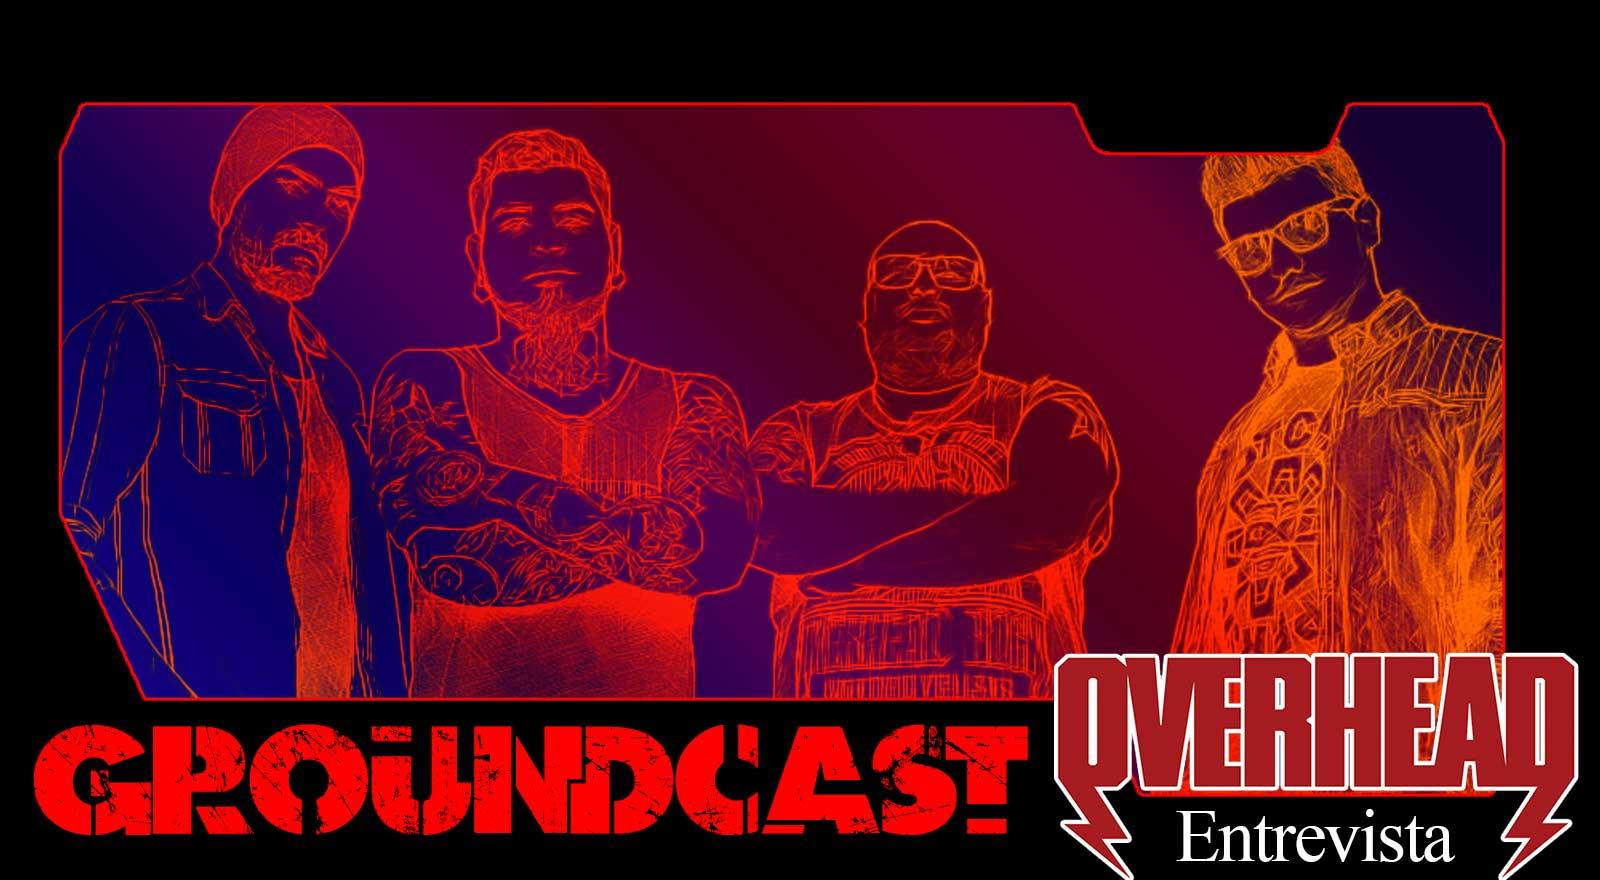 Groundcast Entrevista#16: Overhead